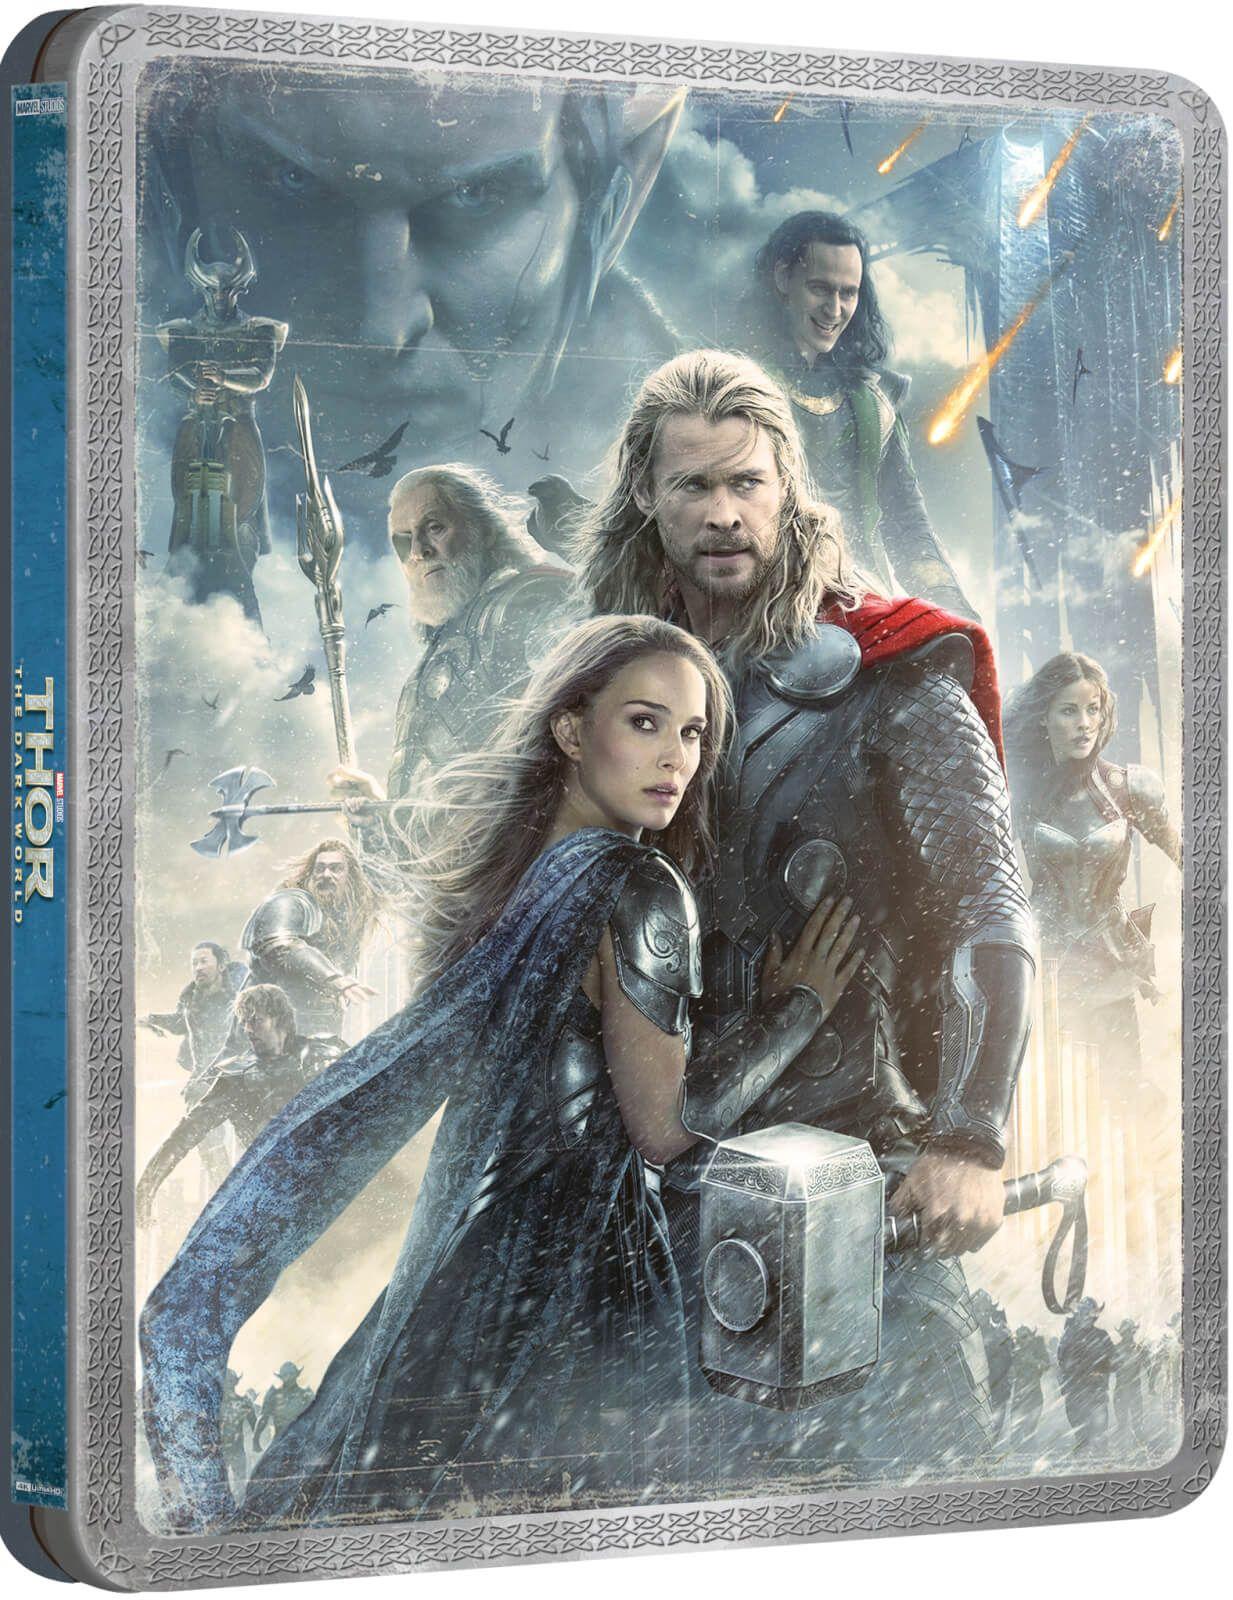 4k blu ray Steelbook Thor Dark World UHD pre order @ zavvi exclusive - £28.99